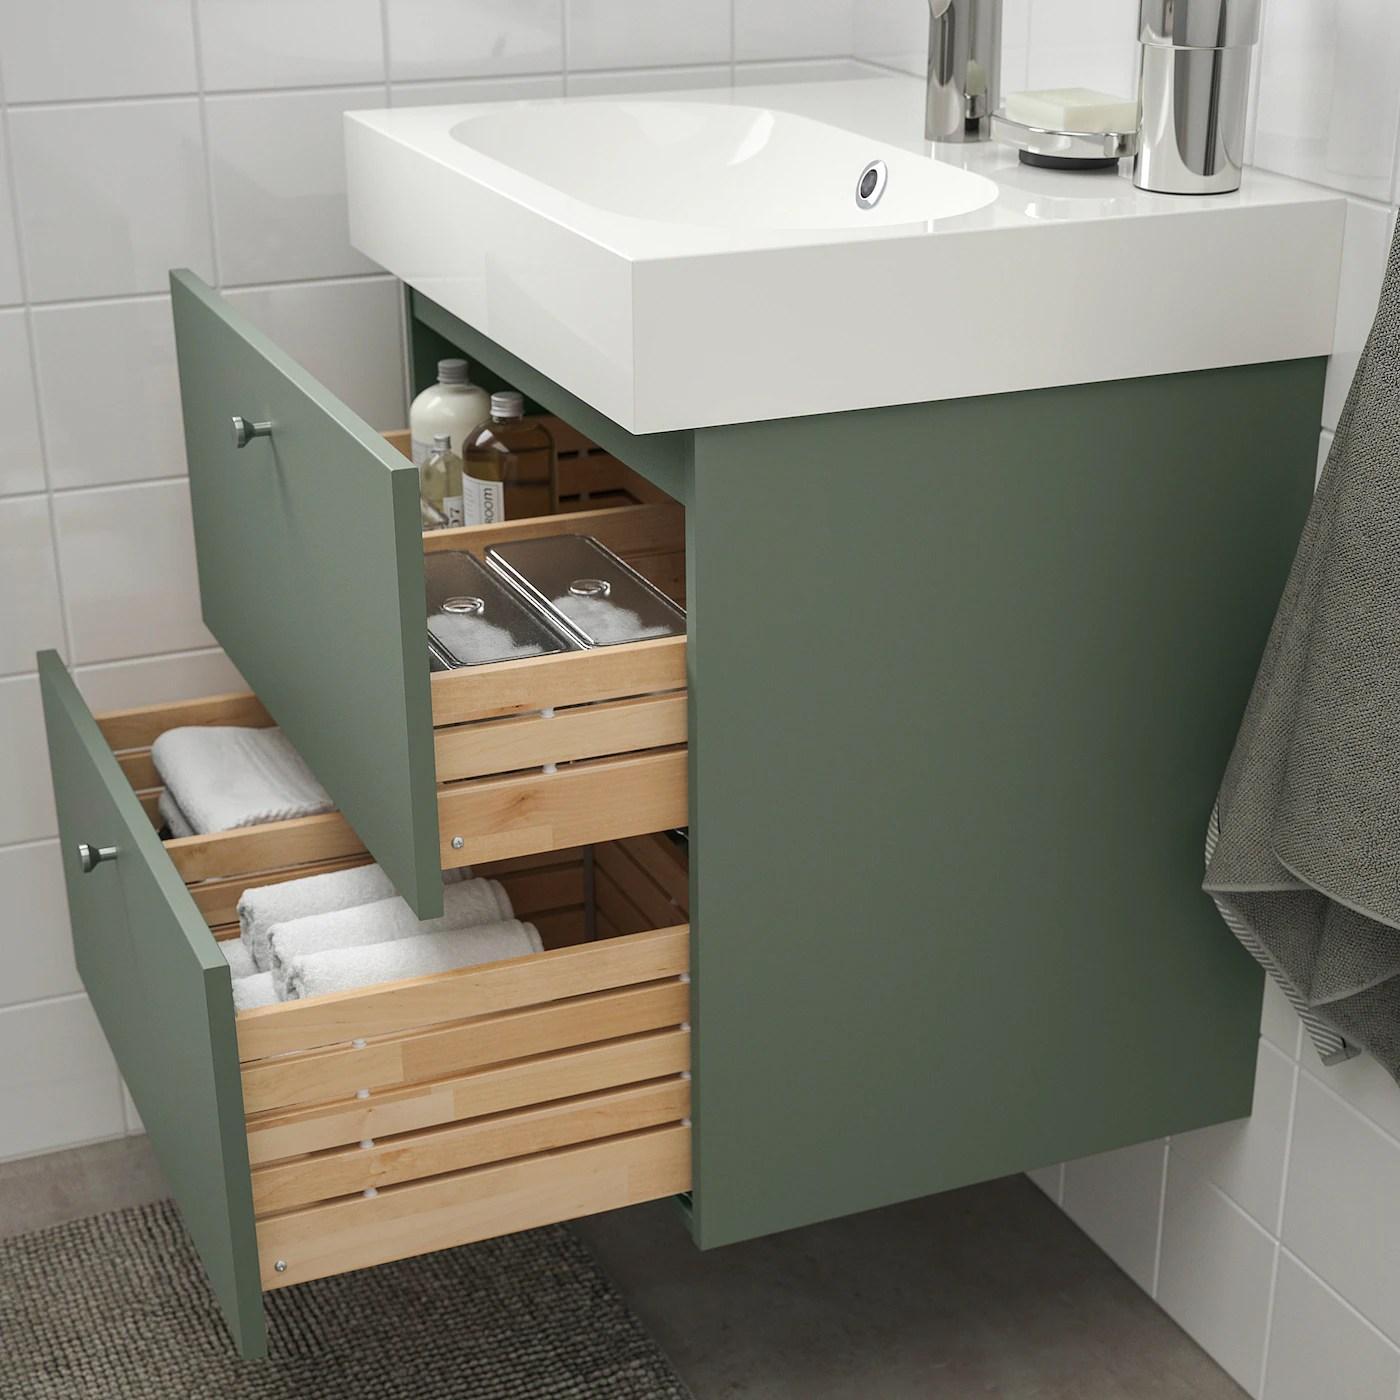 Godmorgon Braviken Sink Cabinet With 2 Drawers Gillburen Gray Green Brogrund Faucet Ikea